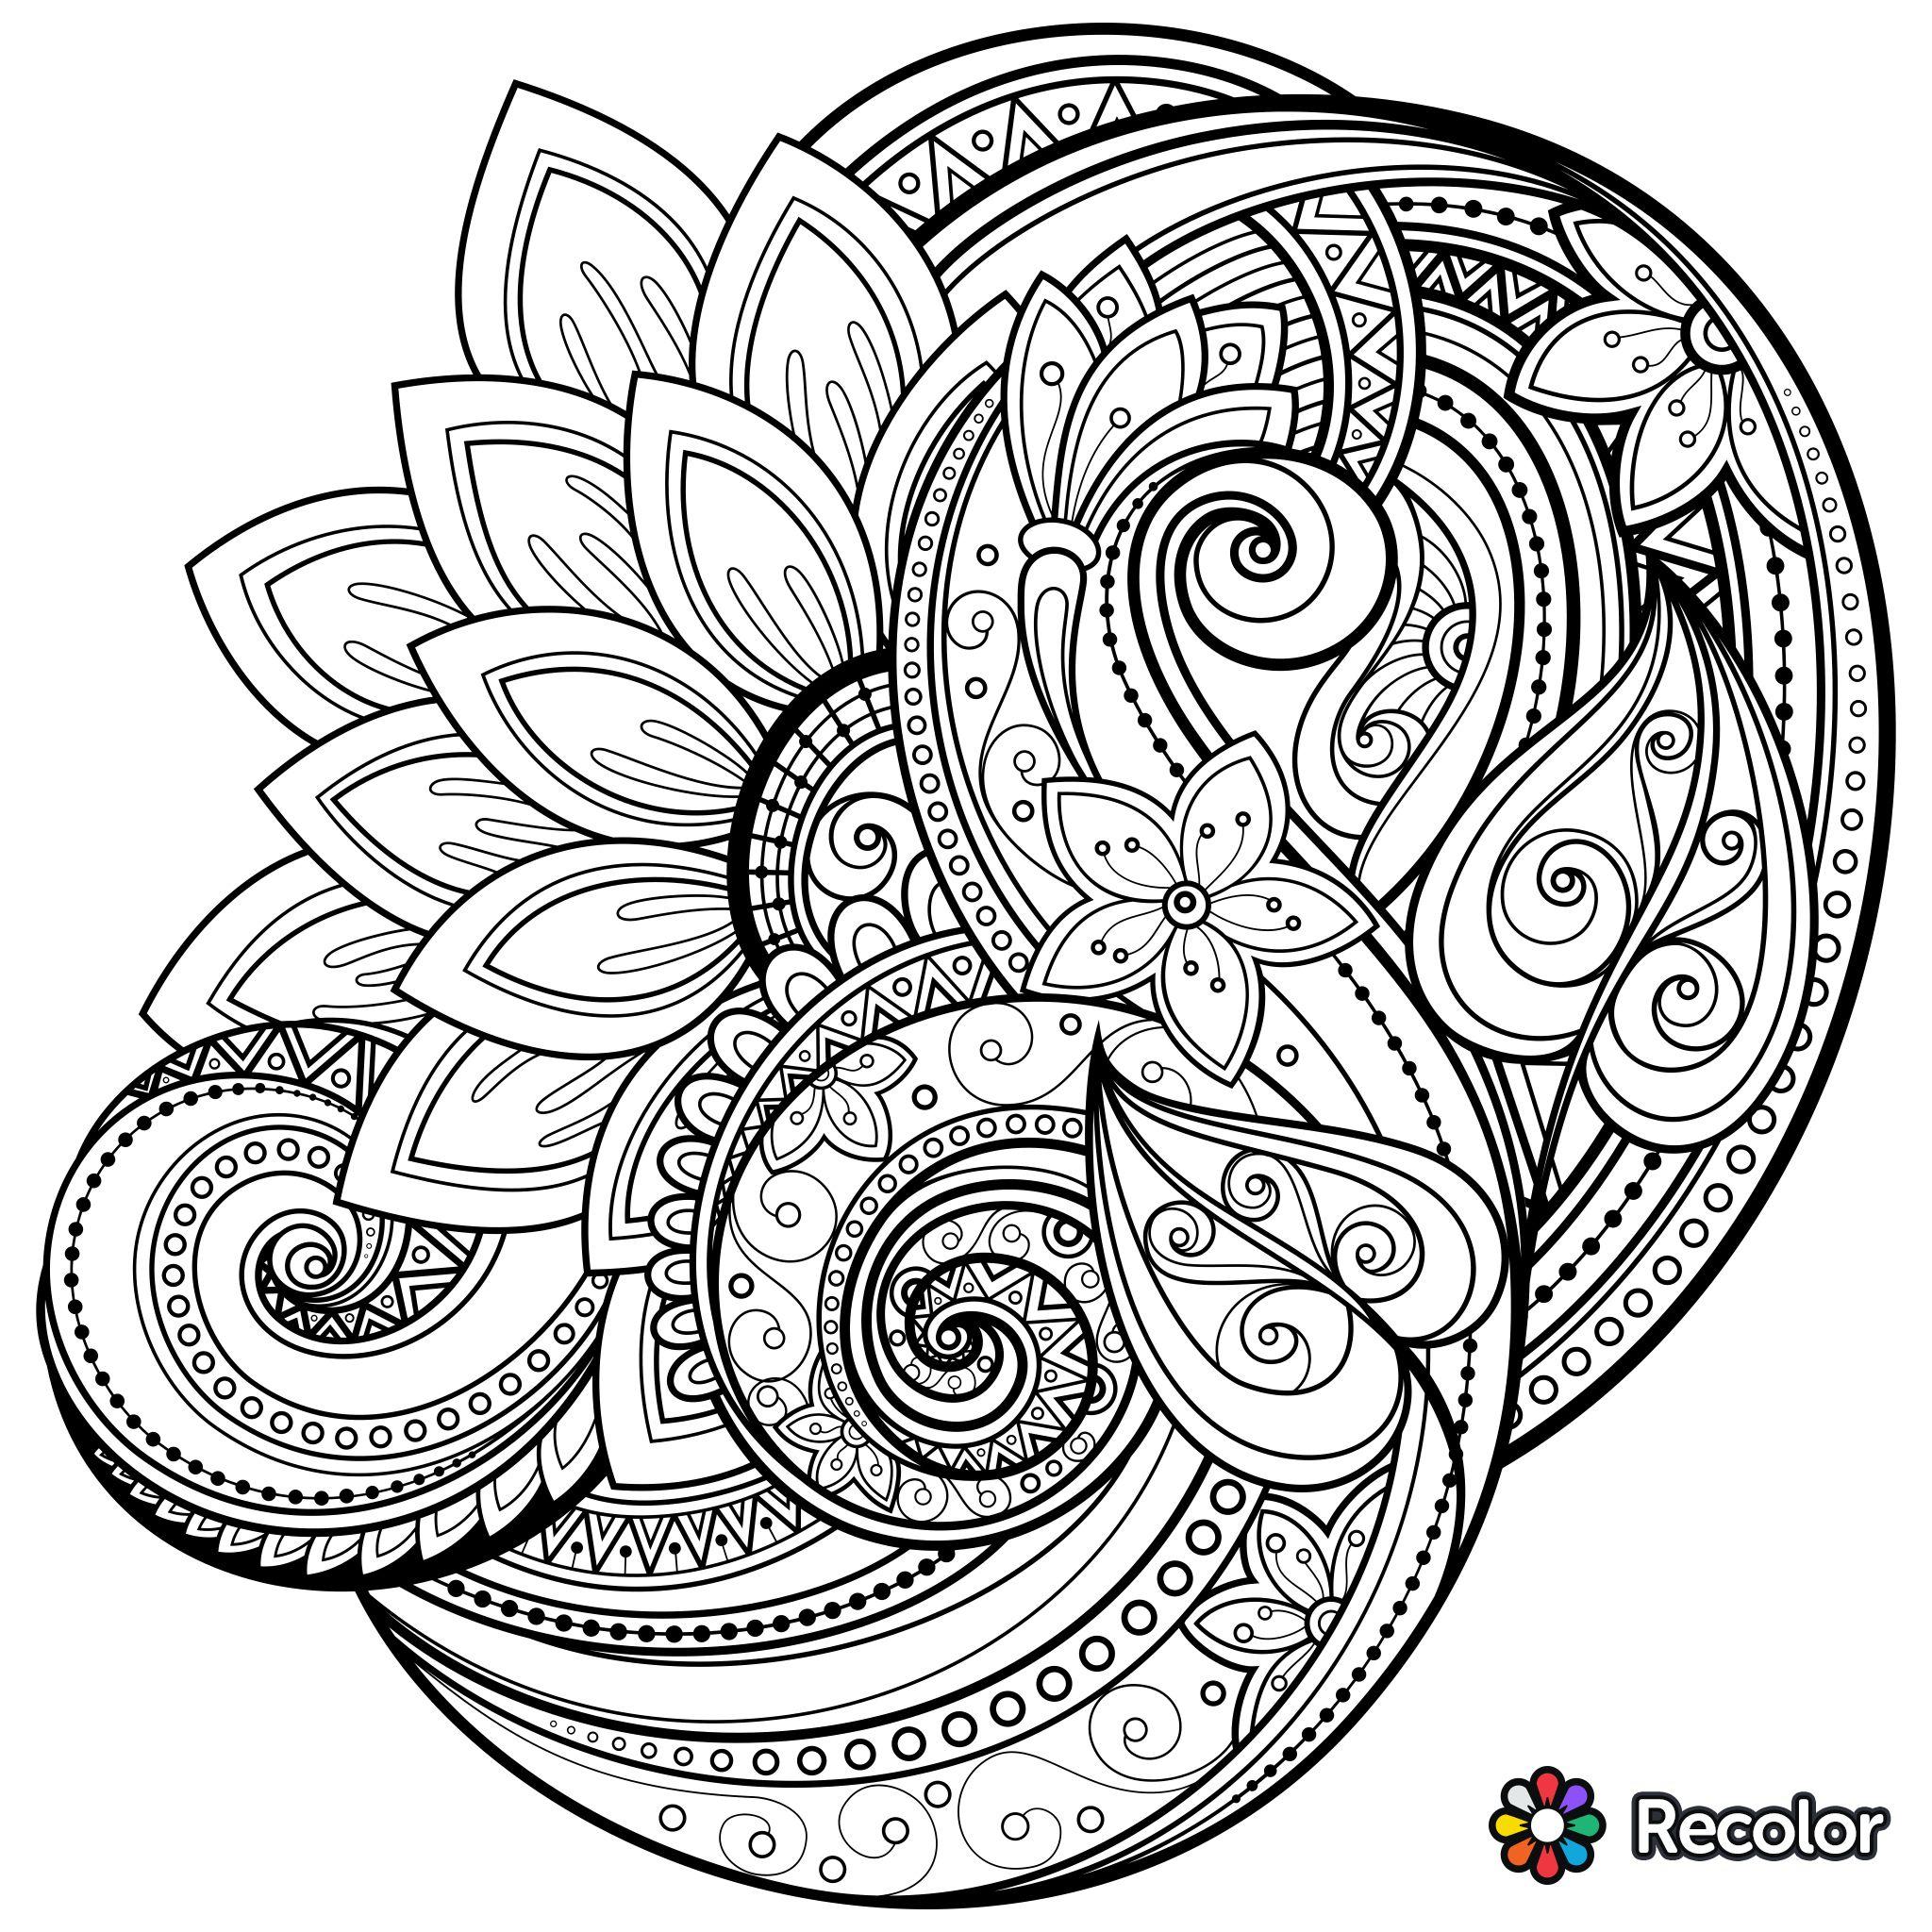 Pin by Eileen Rivera on Zentangle art | Drawings, Mandala ...